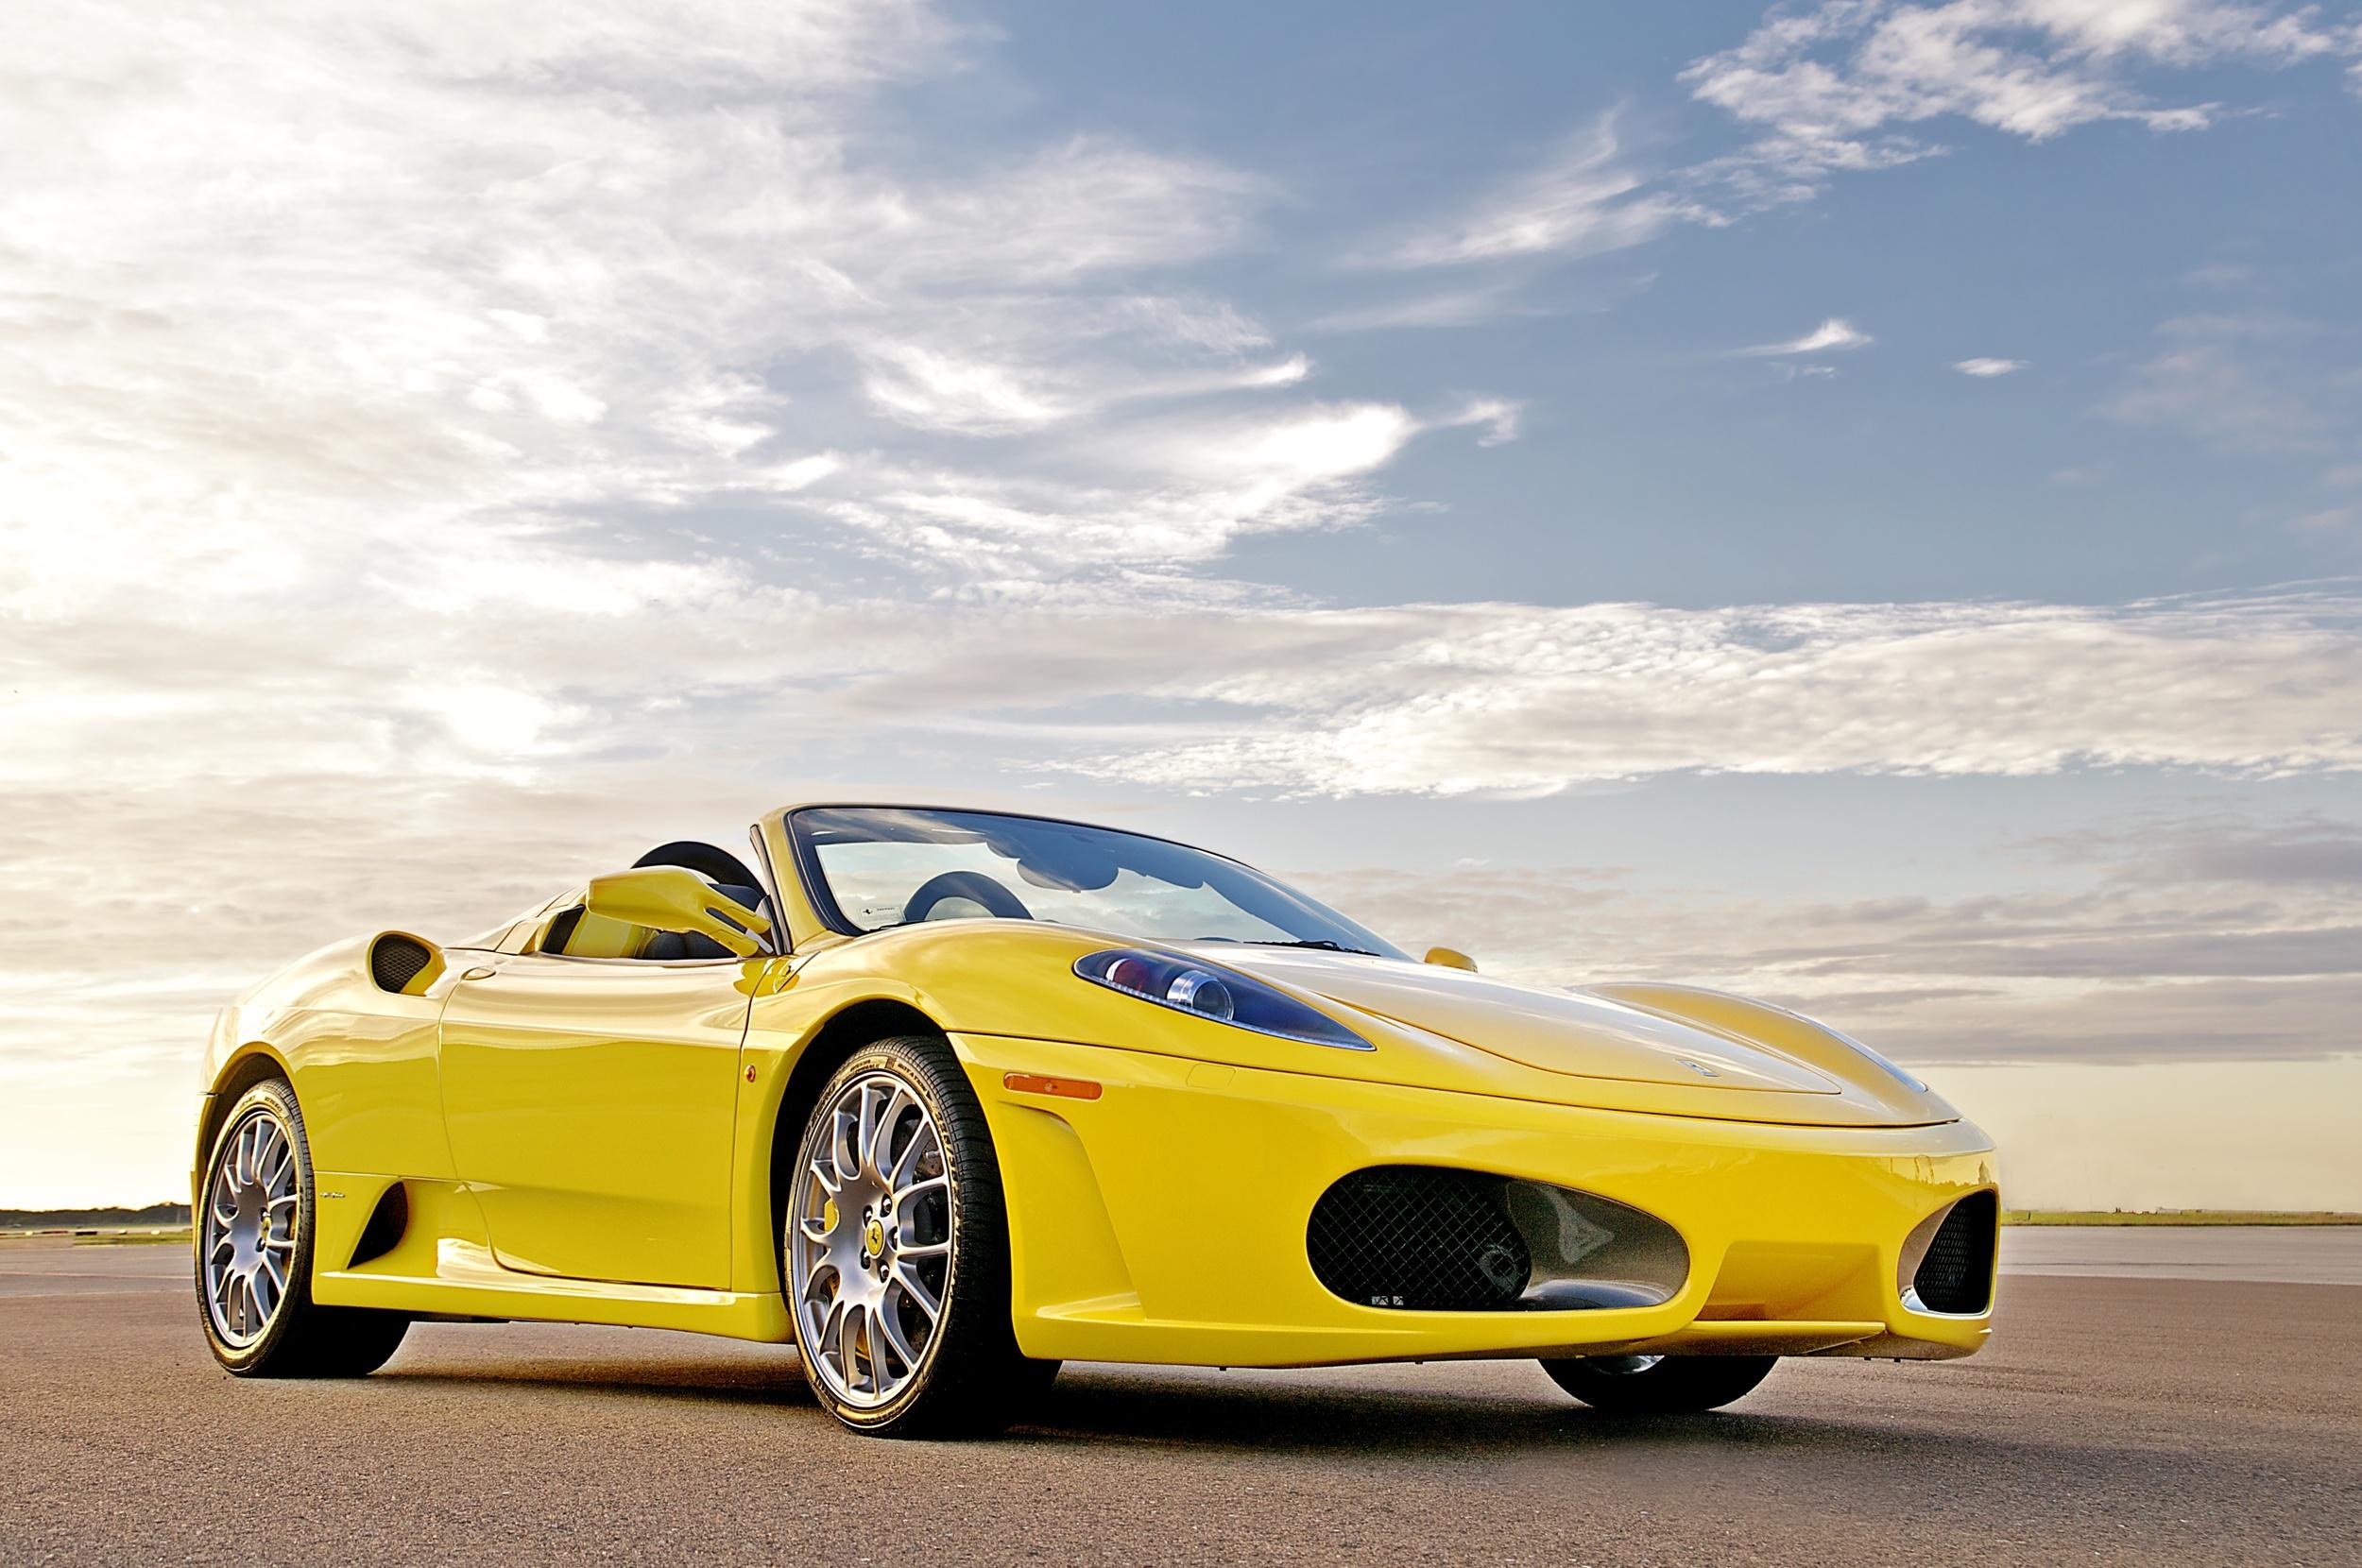 Ferrari F430 Spider yellow Florida Car Photography